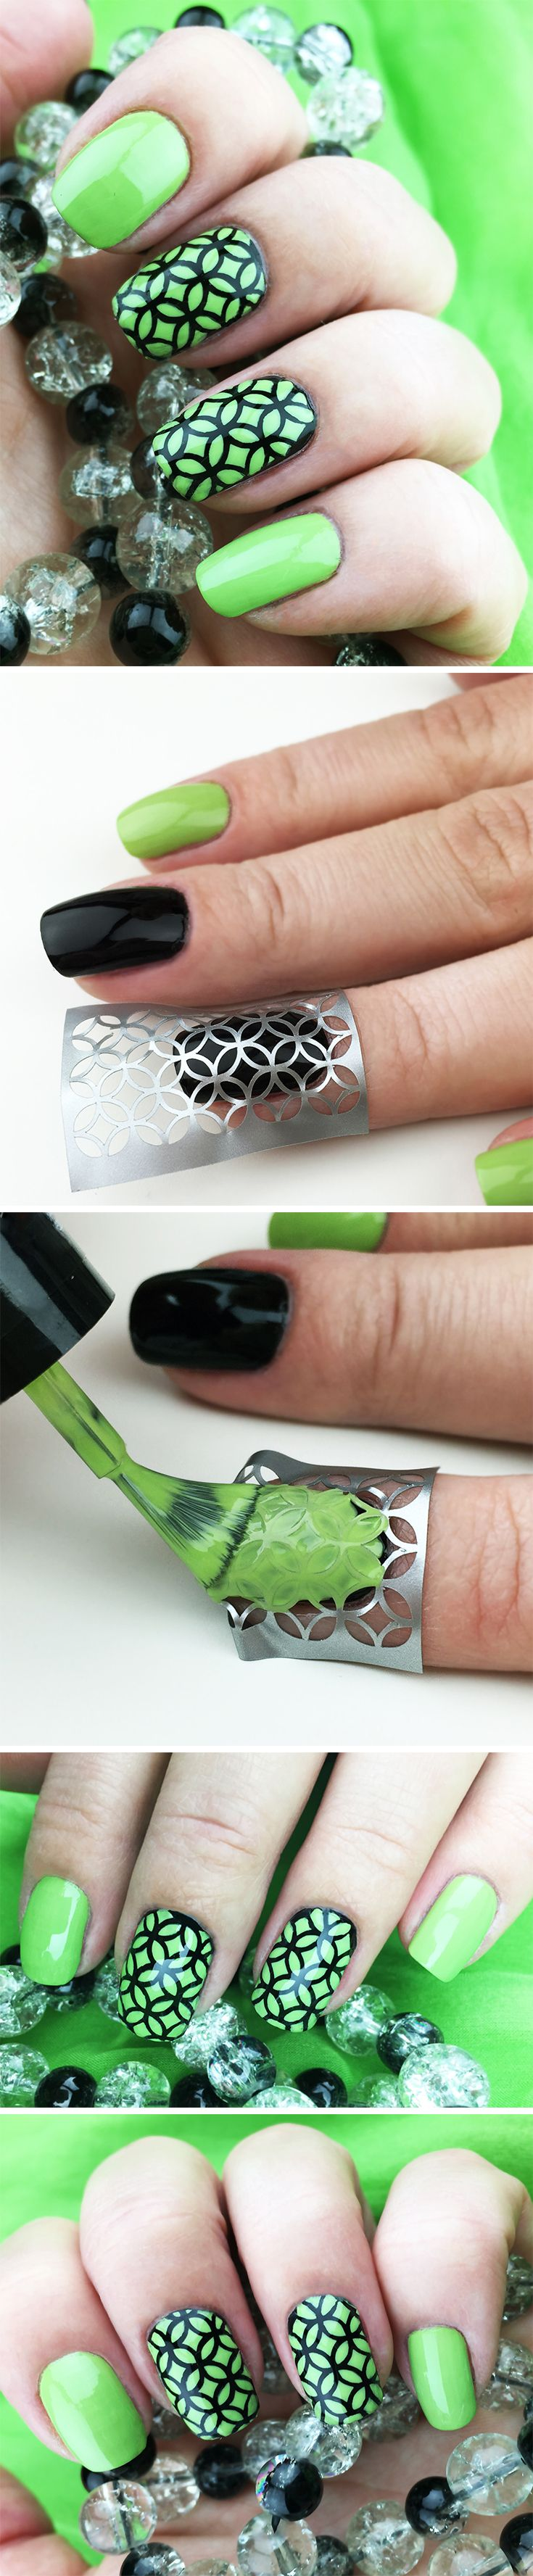 Nail Stencils design \